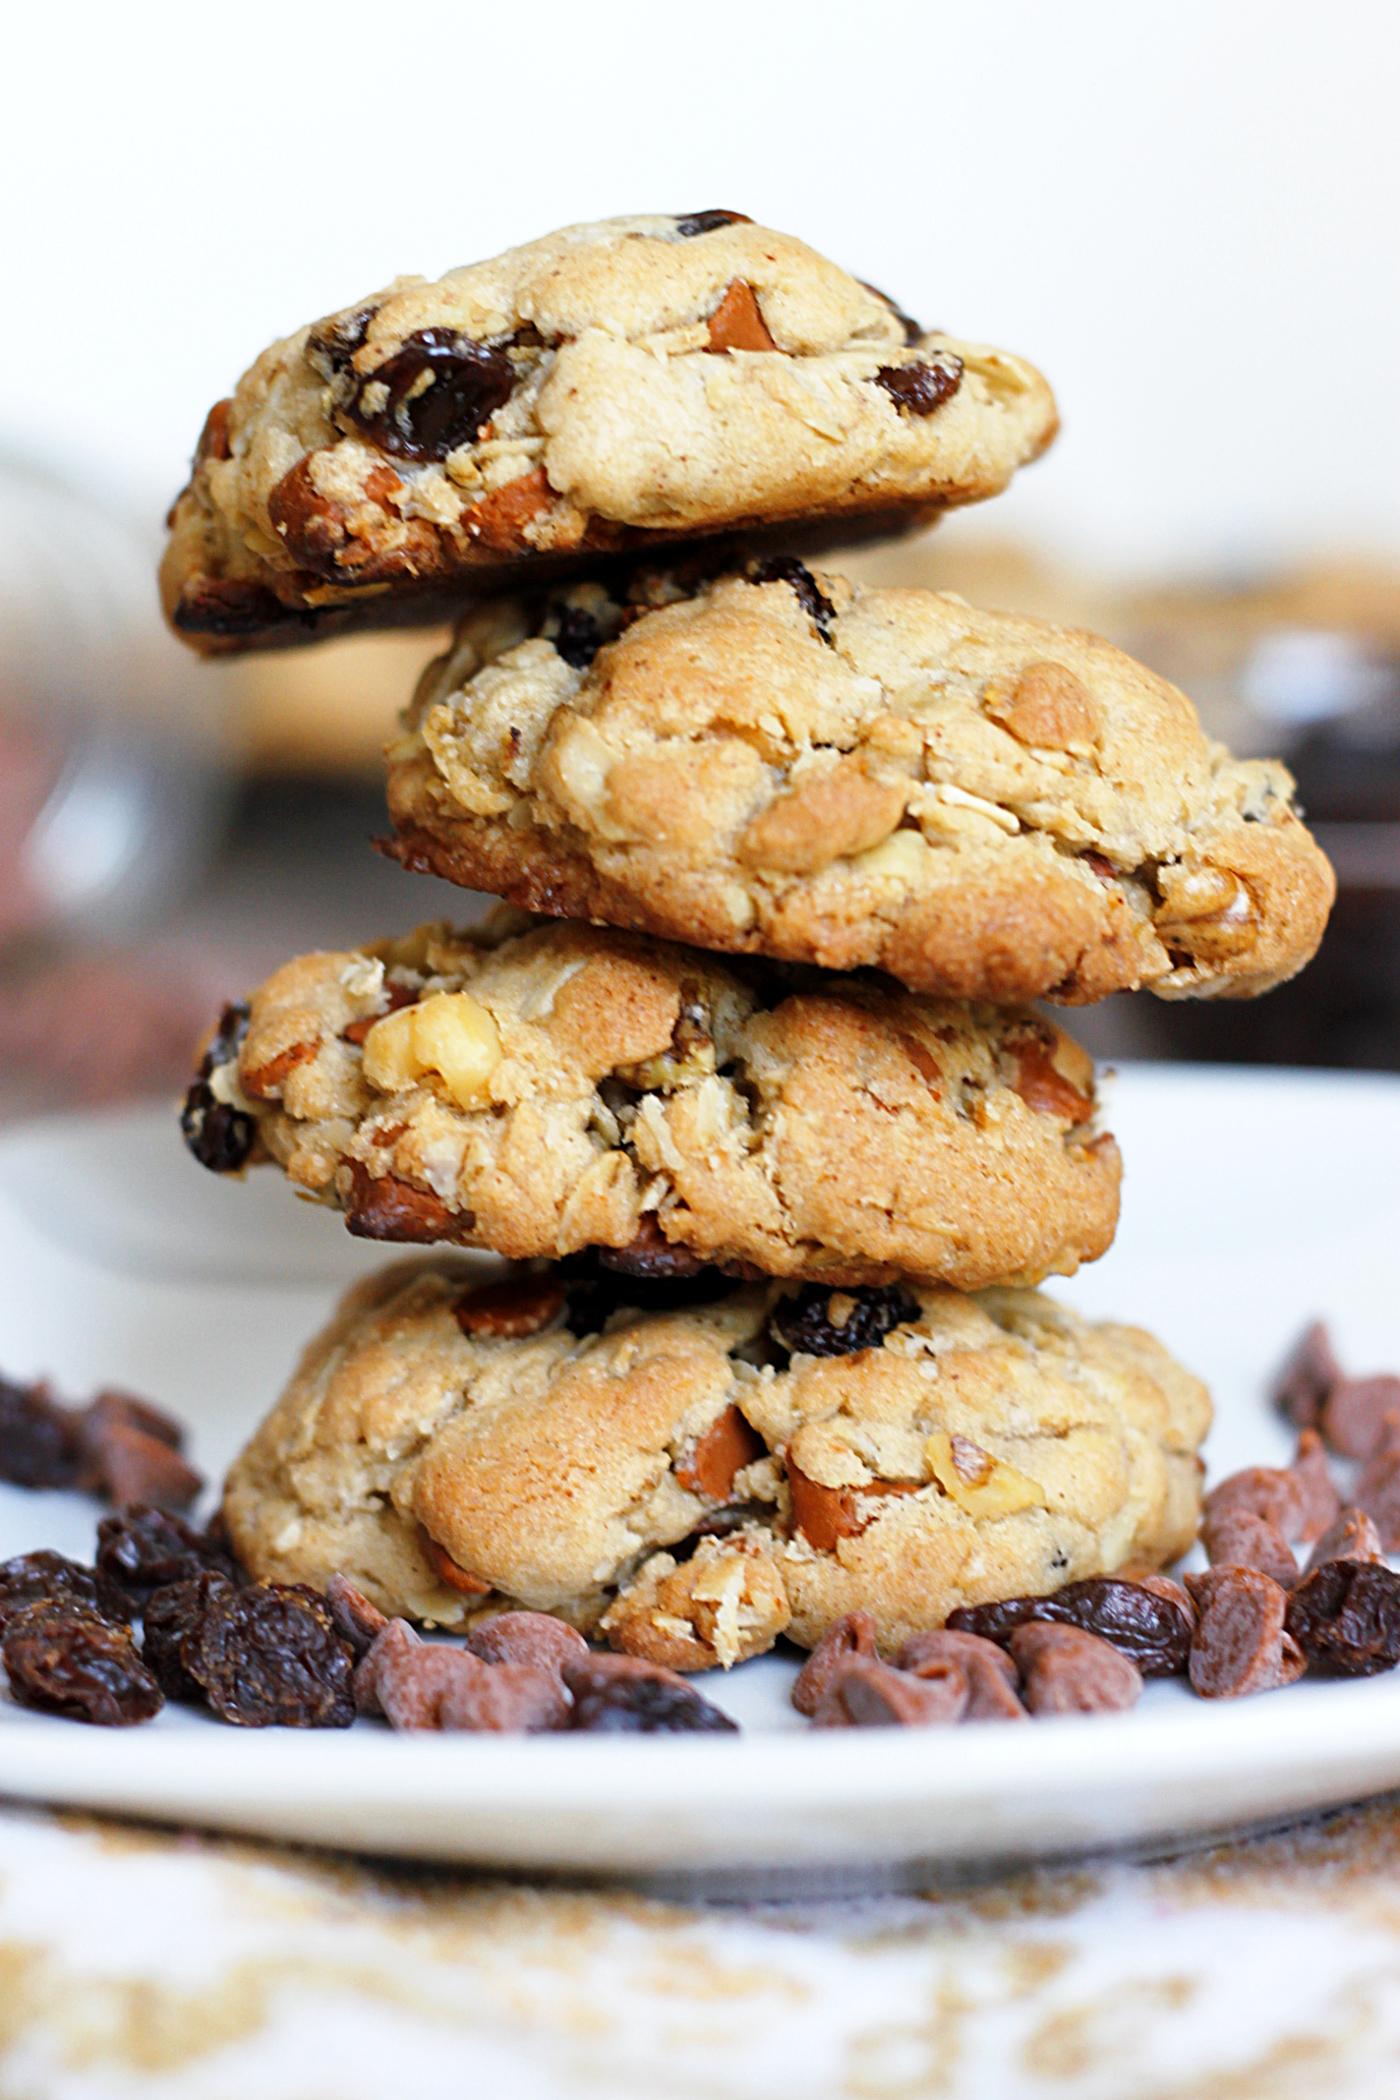 Cinnamon Raisin Walnut Oatmeal Cookies